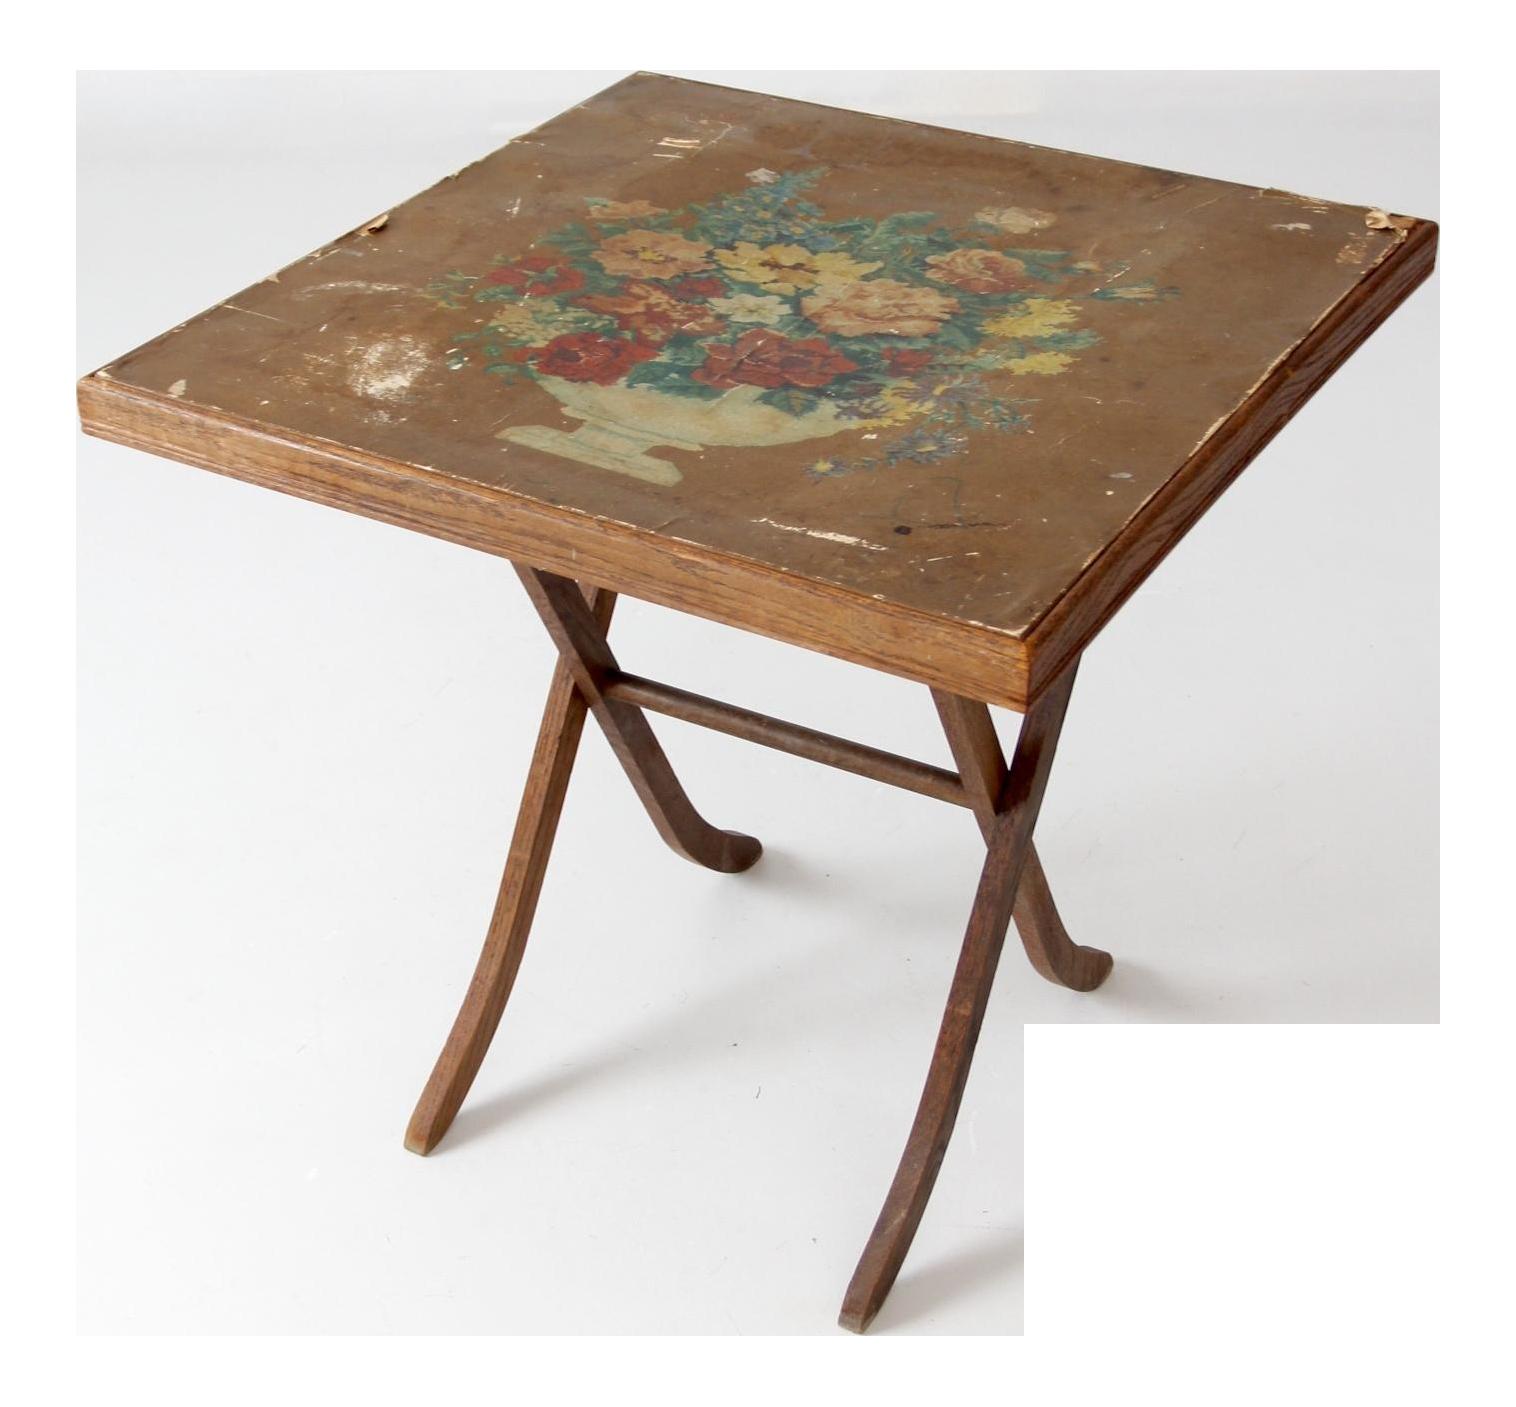 Vintage Floral Folding Table